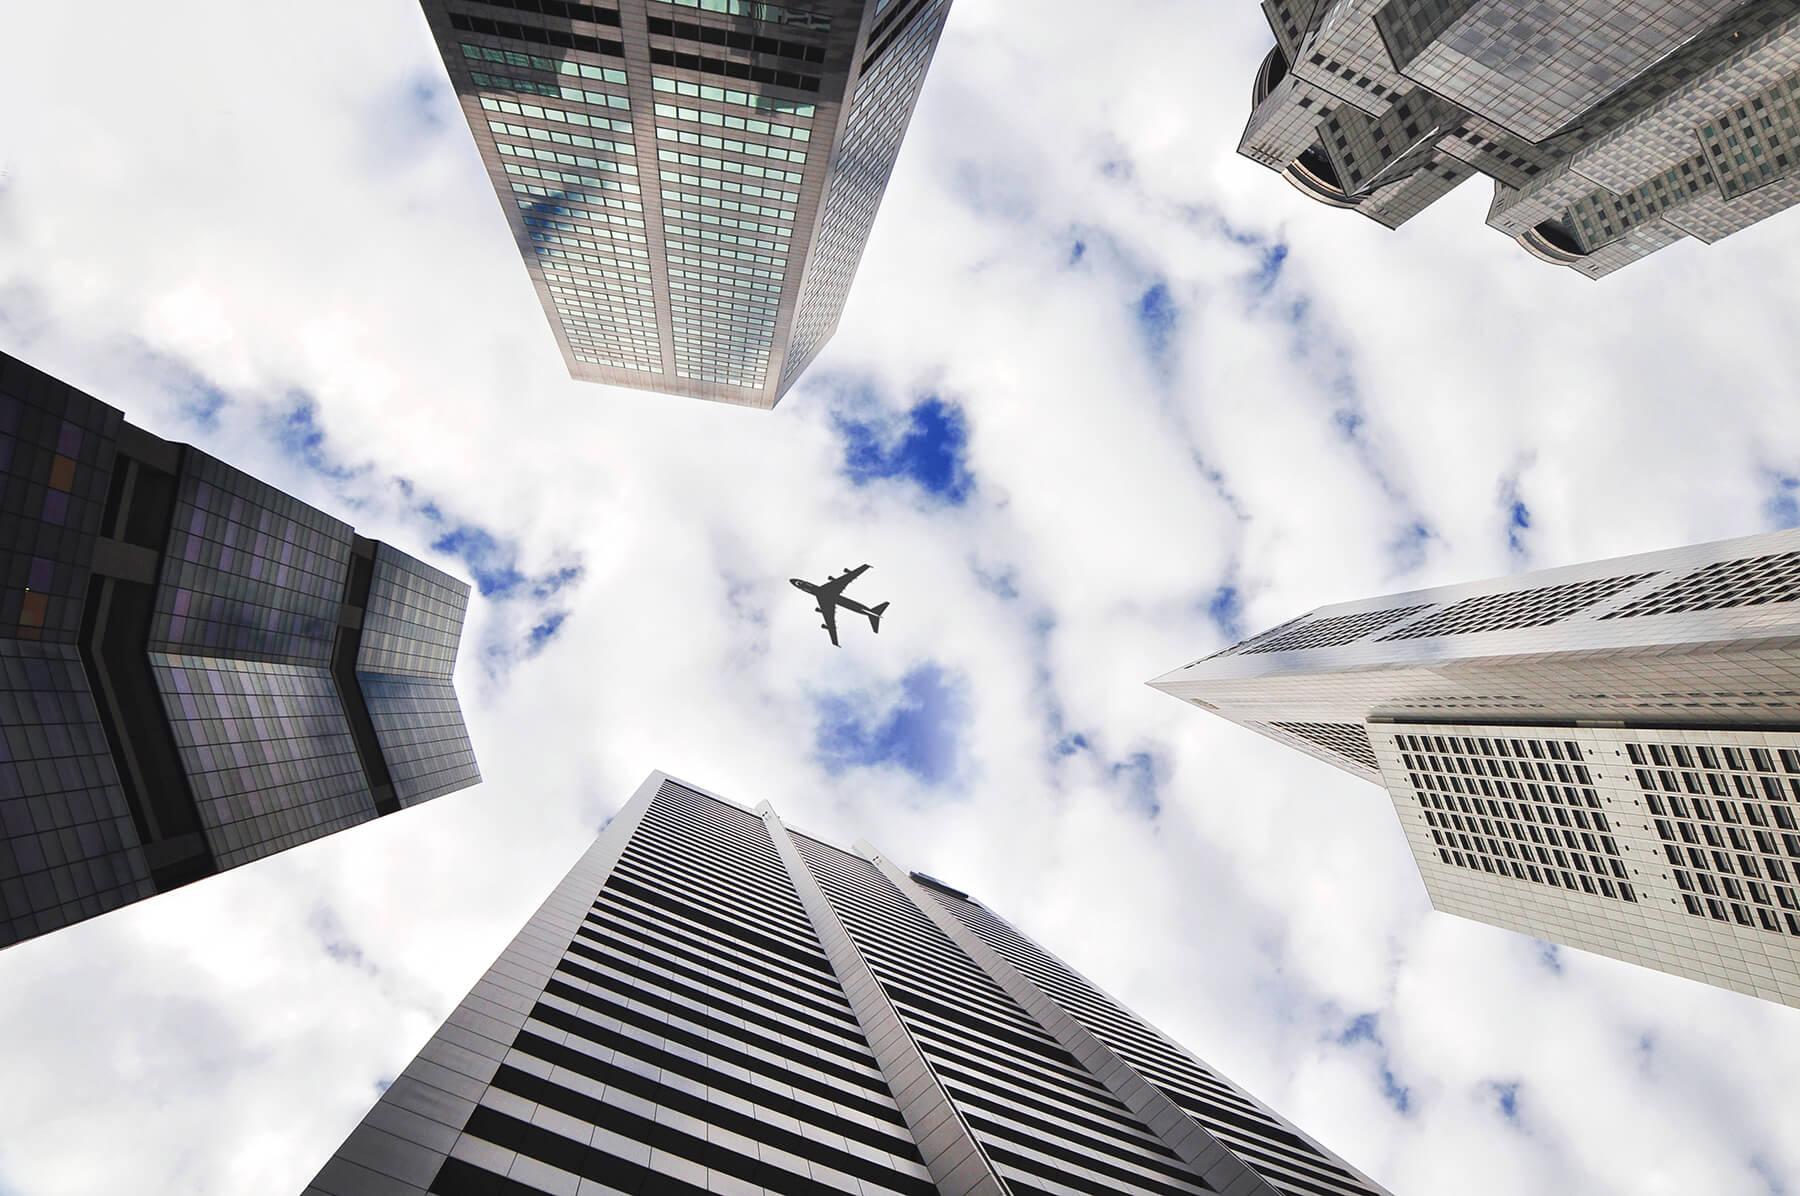 Converging vertical lines of skyscrapers